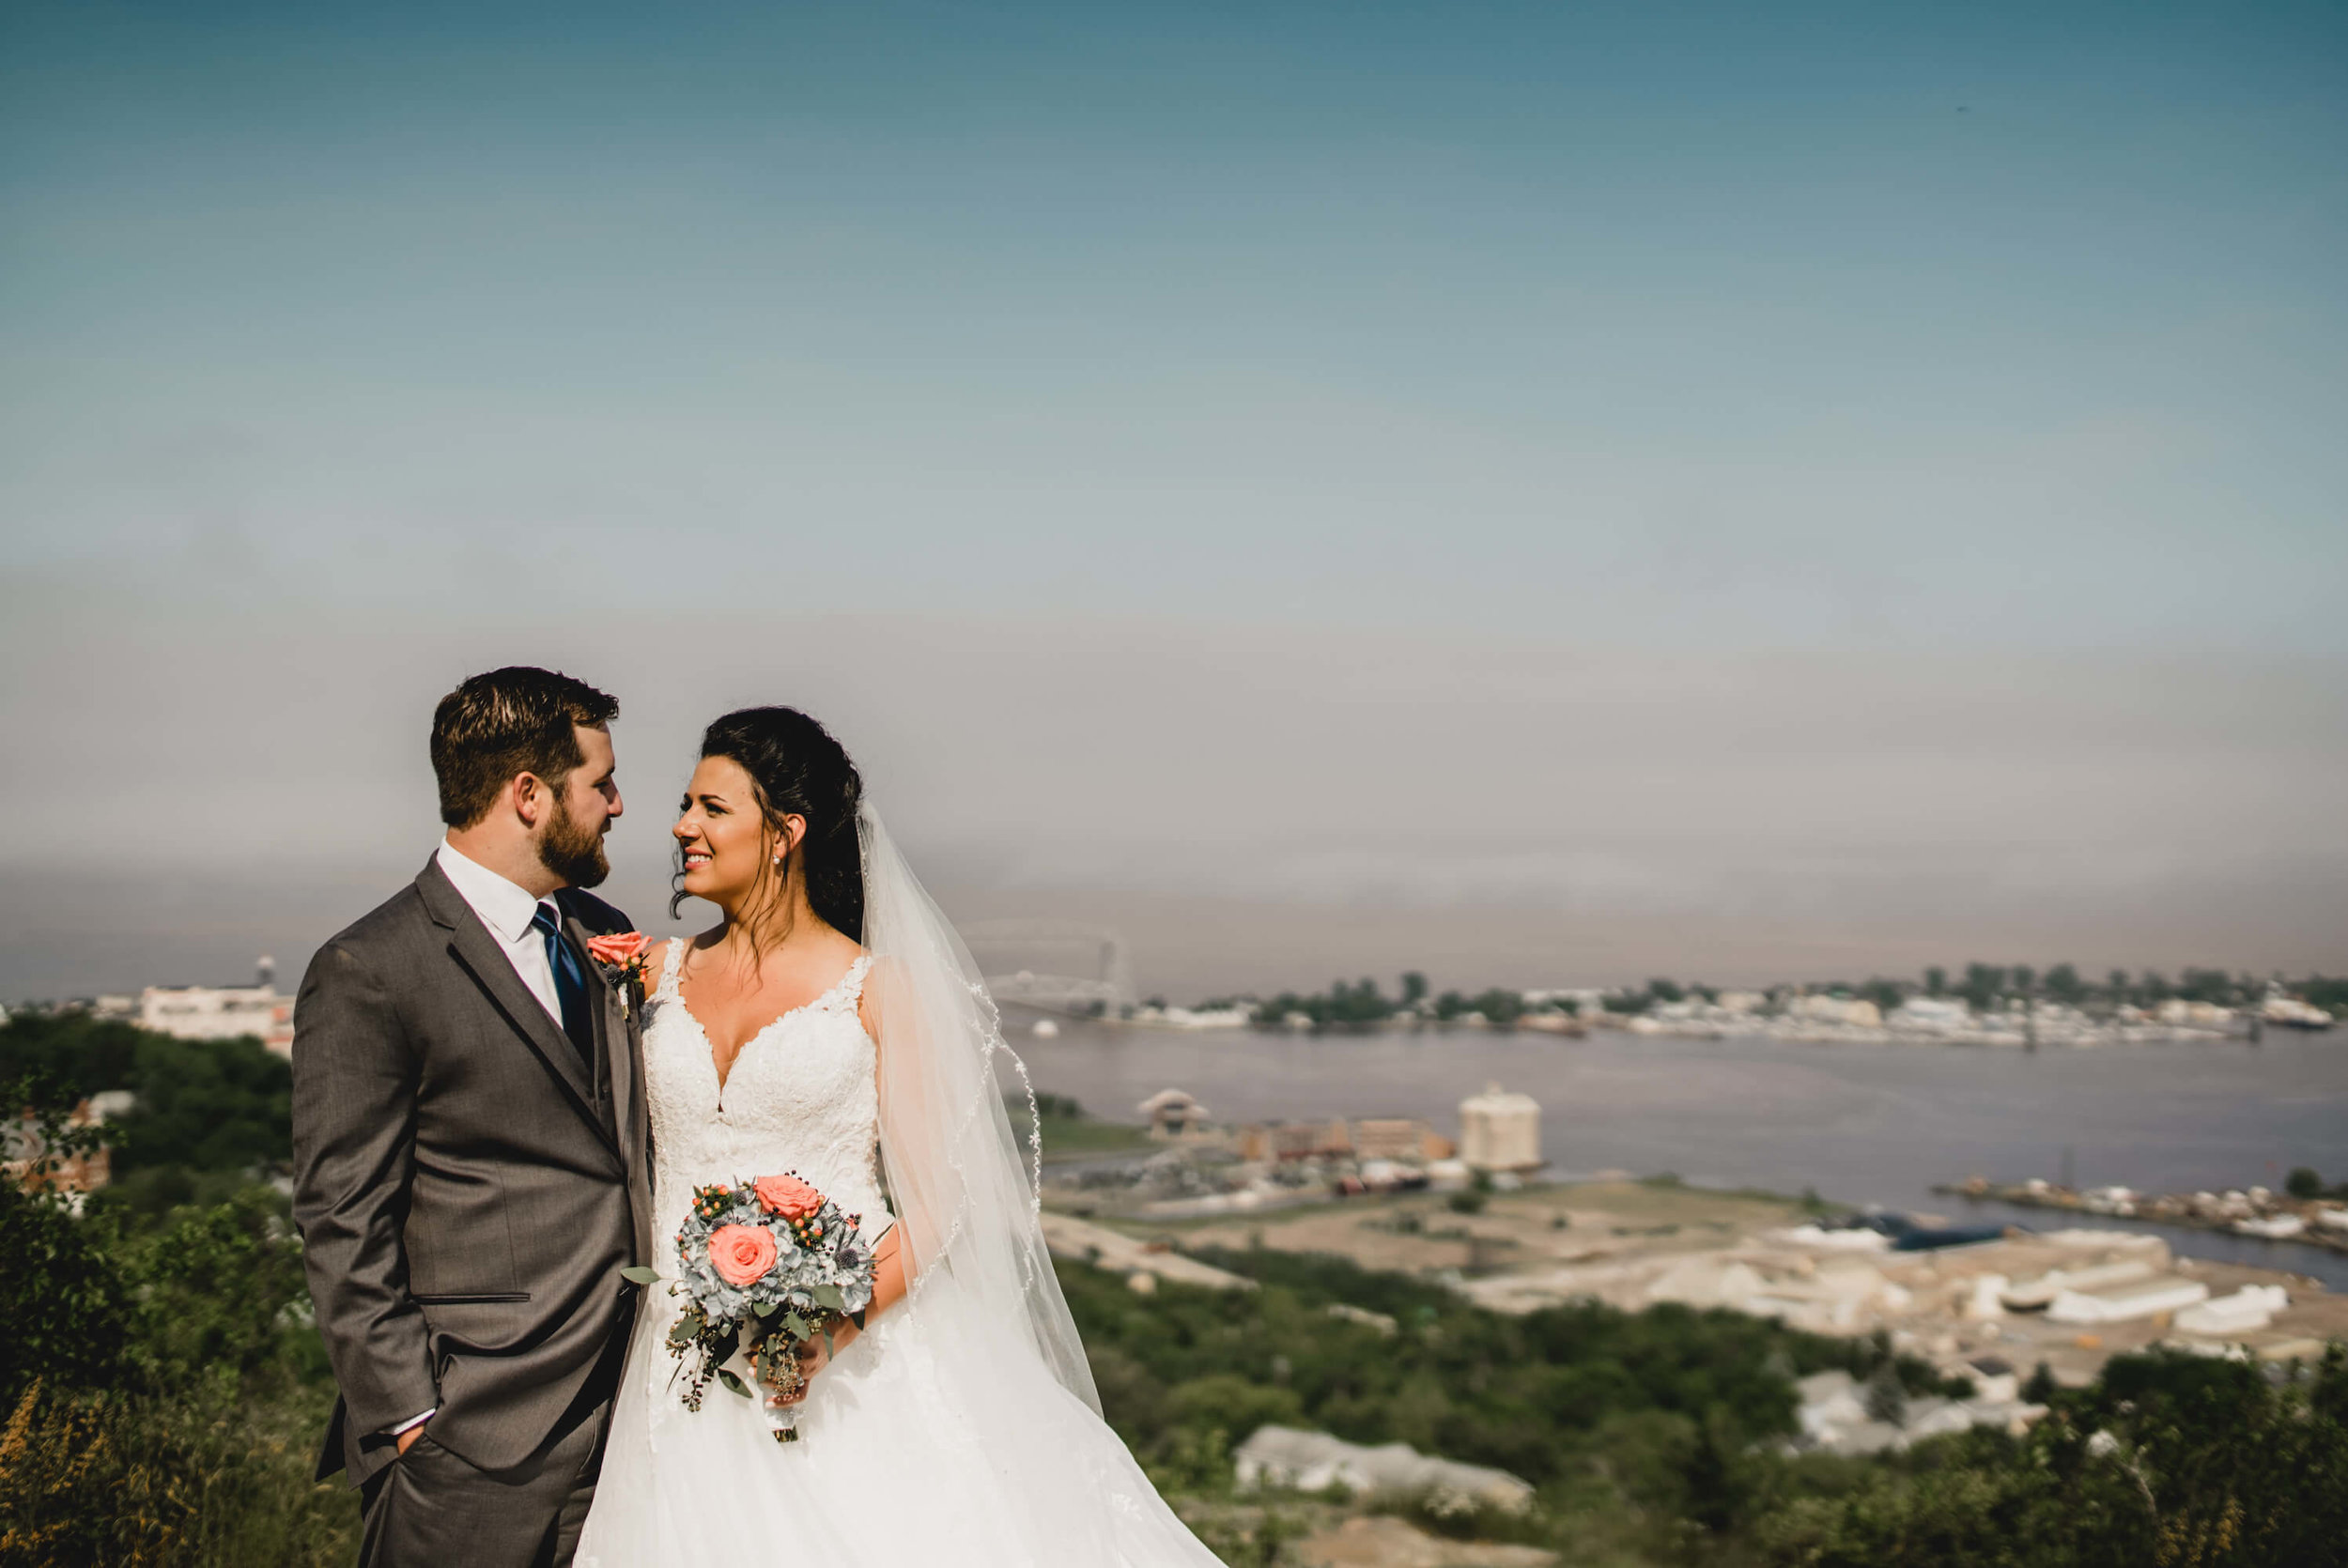 engle-olson-jen-chad-minnesota-wedding- (499 of 1332).jpg